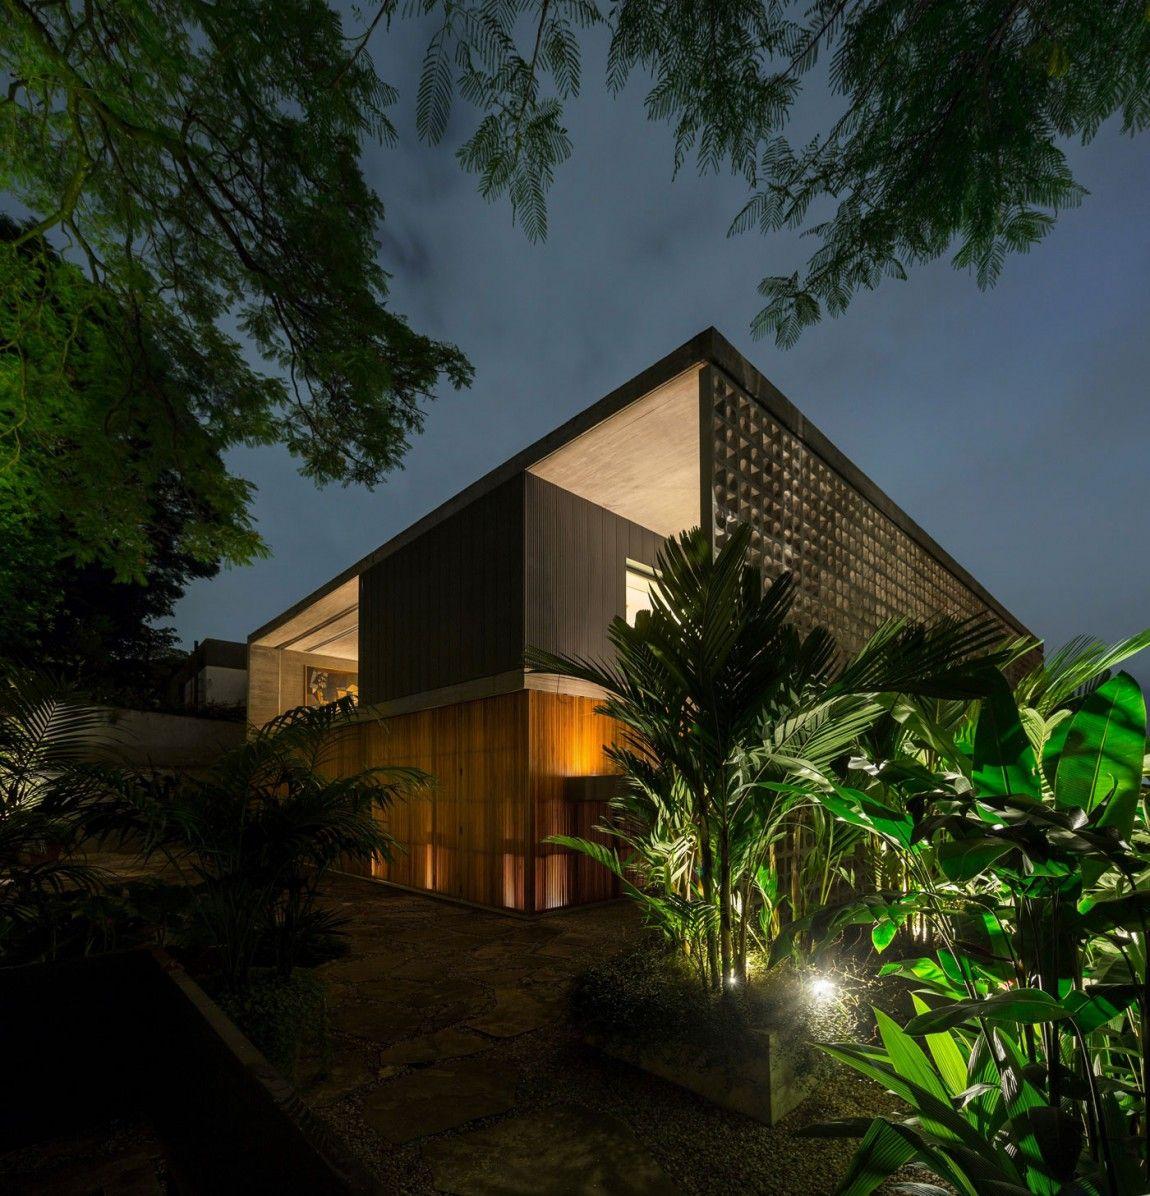 B+B House in São Paulo, Brasil by Studio mk27 & Galeria Arquitetos